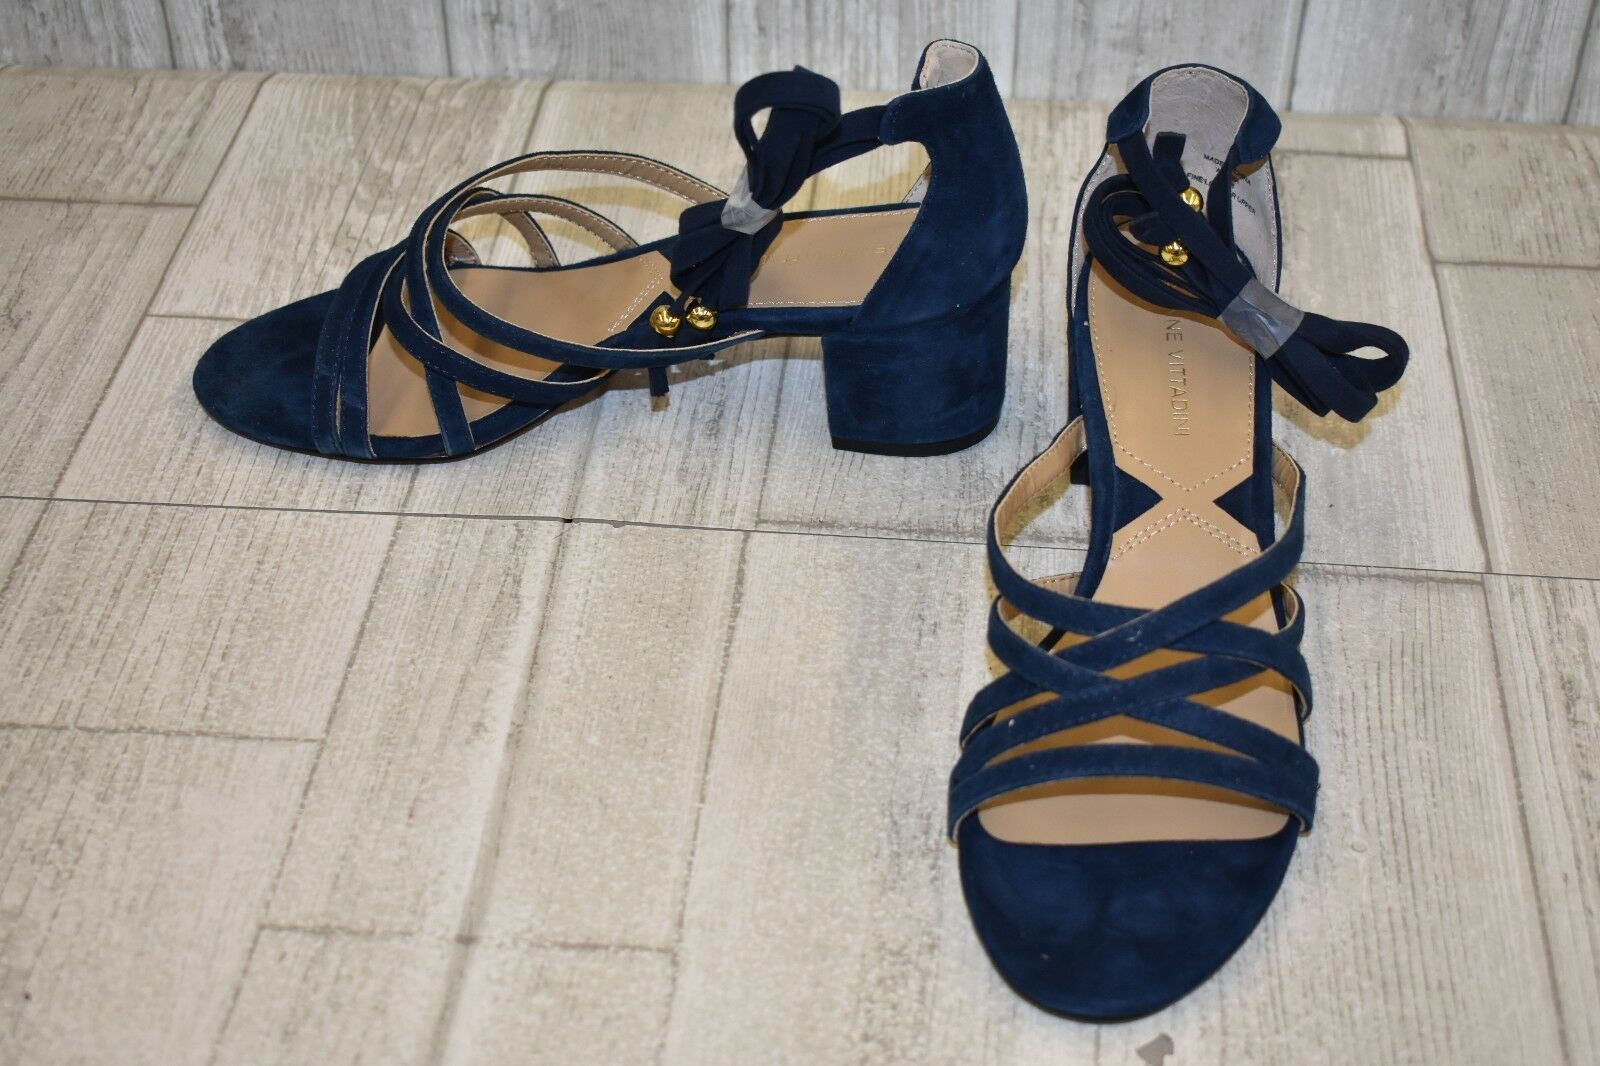 Adrienne Vittadini Alesia Dress Sandal - Women's Size 7.5M - Navy